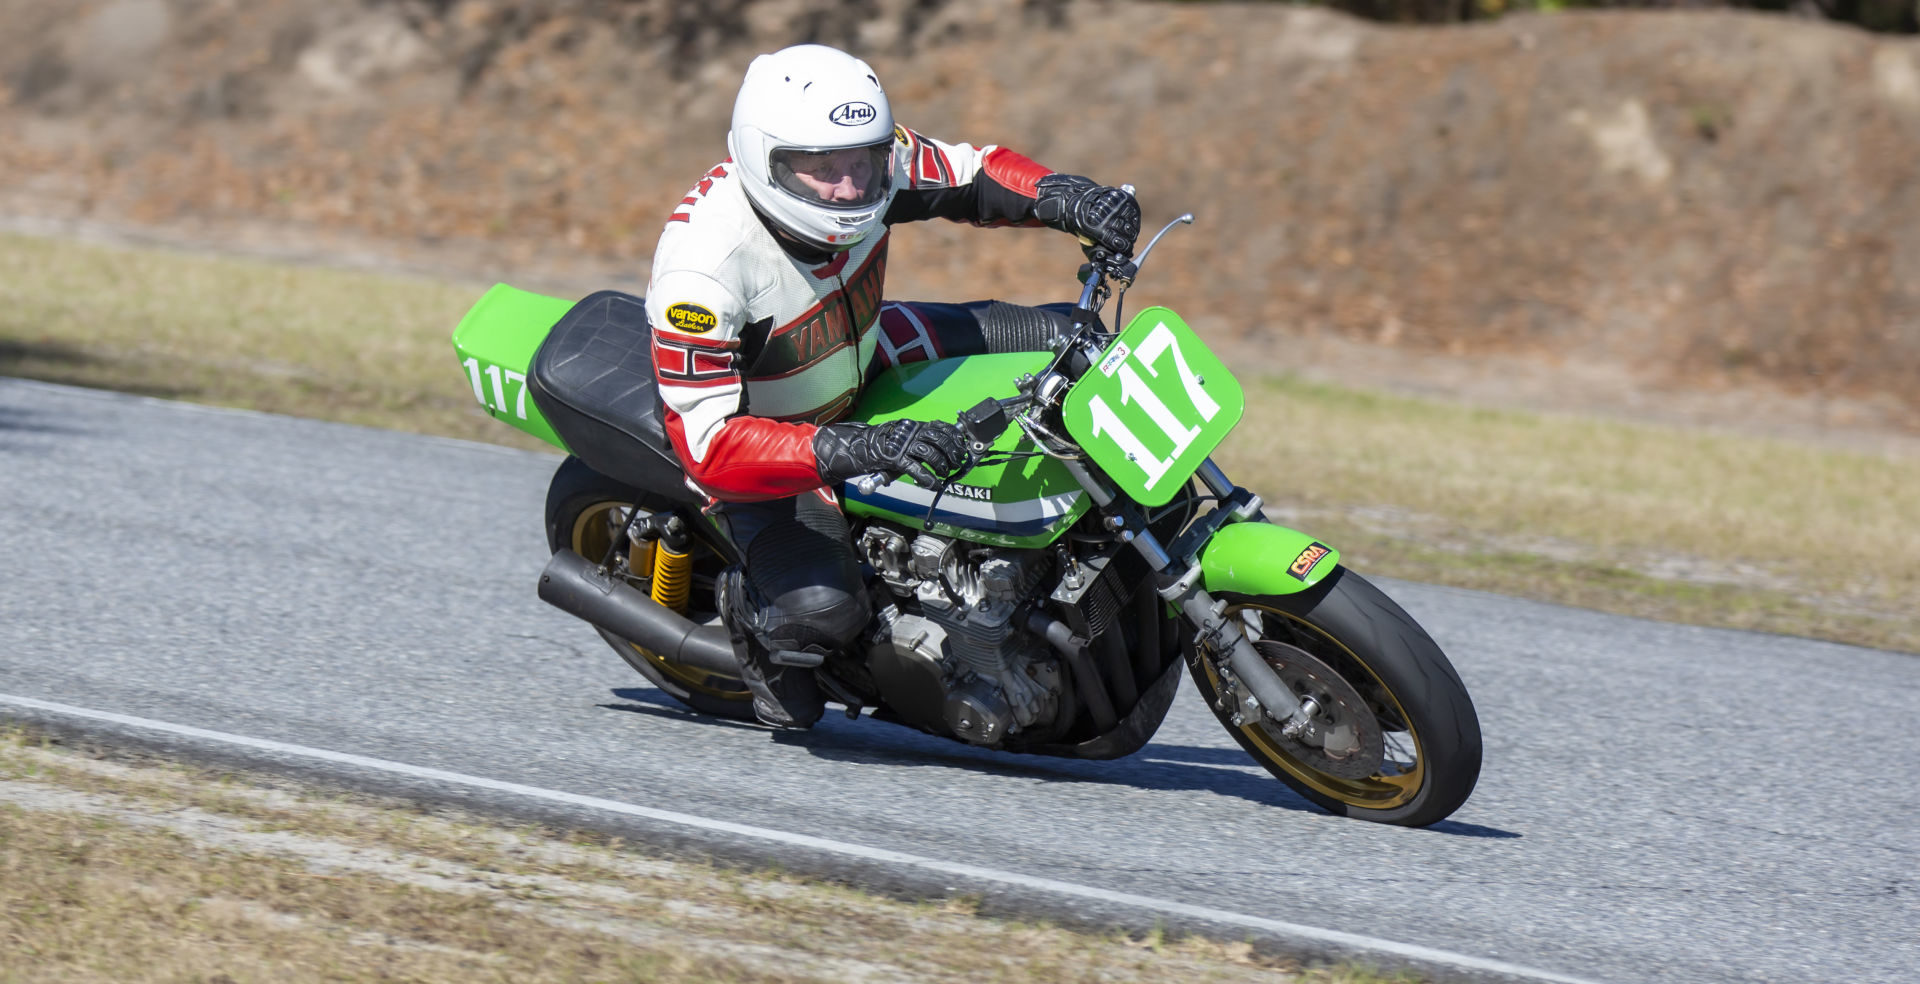 AHRMA racer David Crussell (117) on a Kawasaki